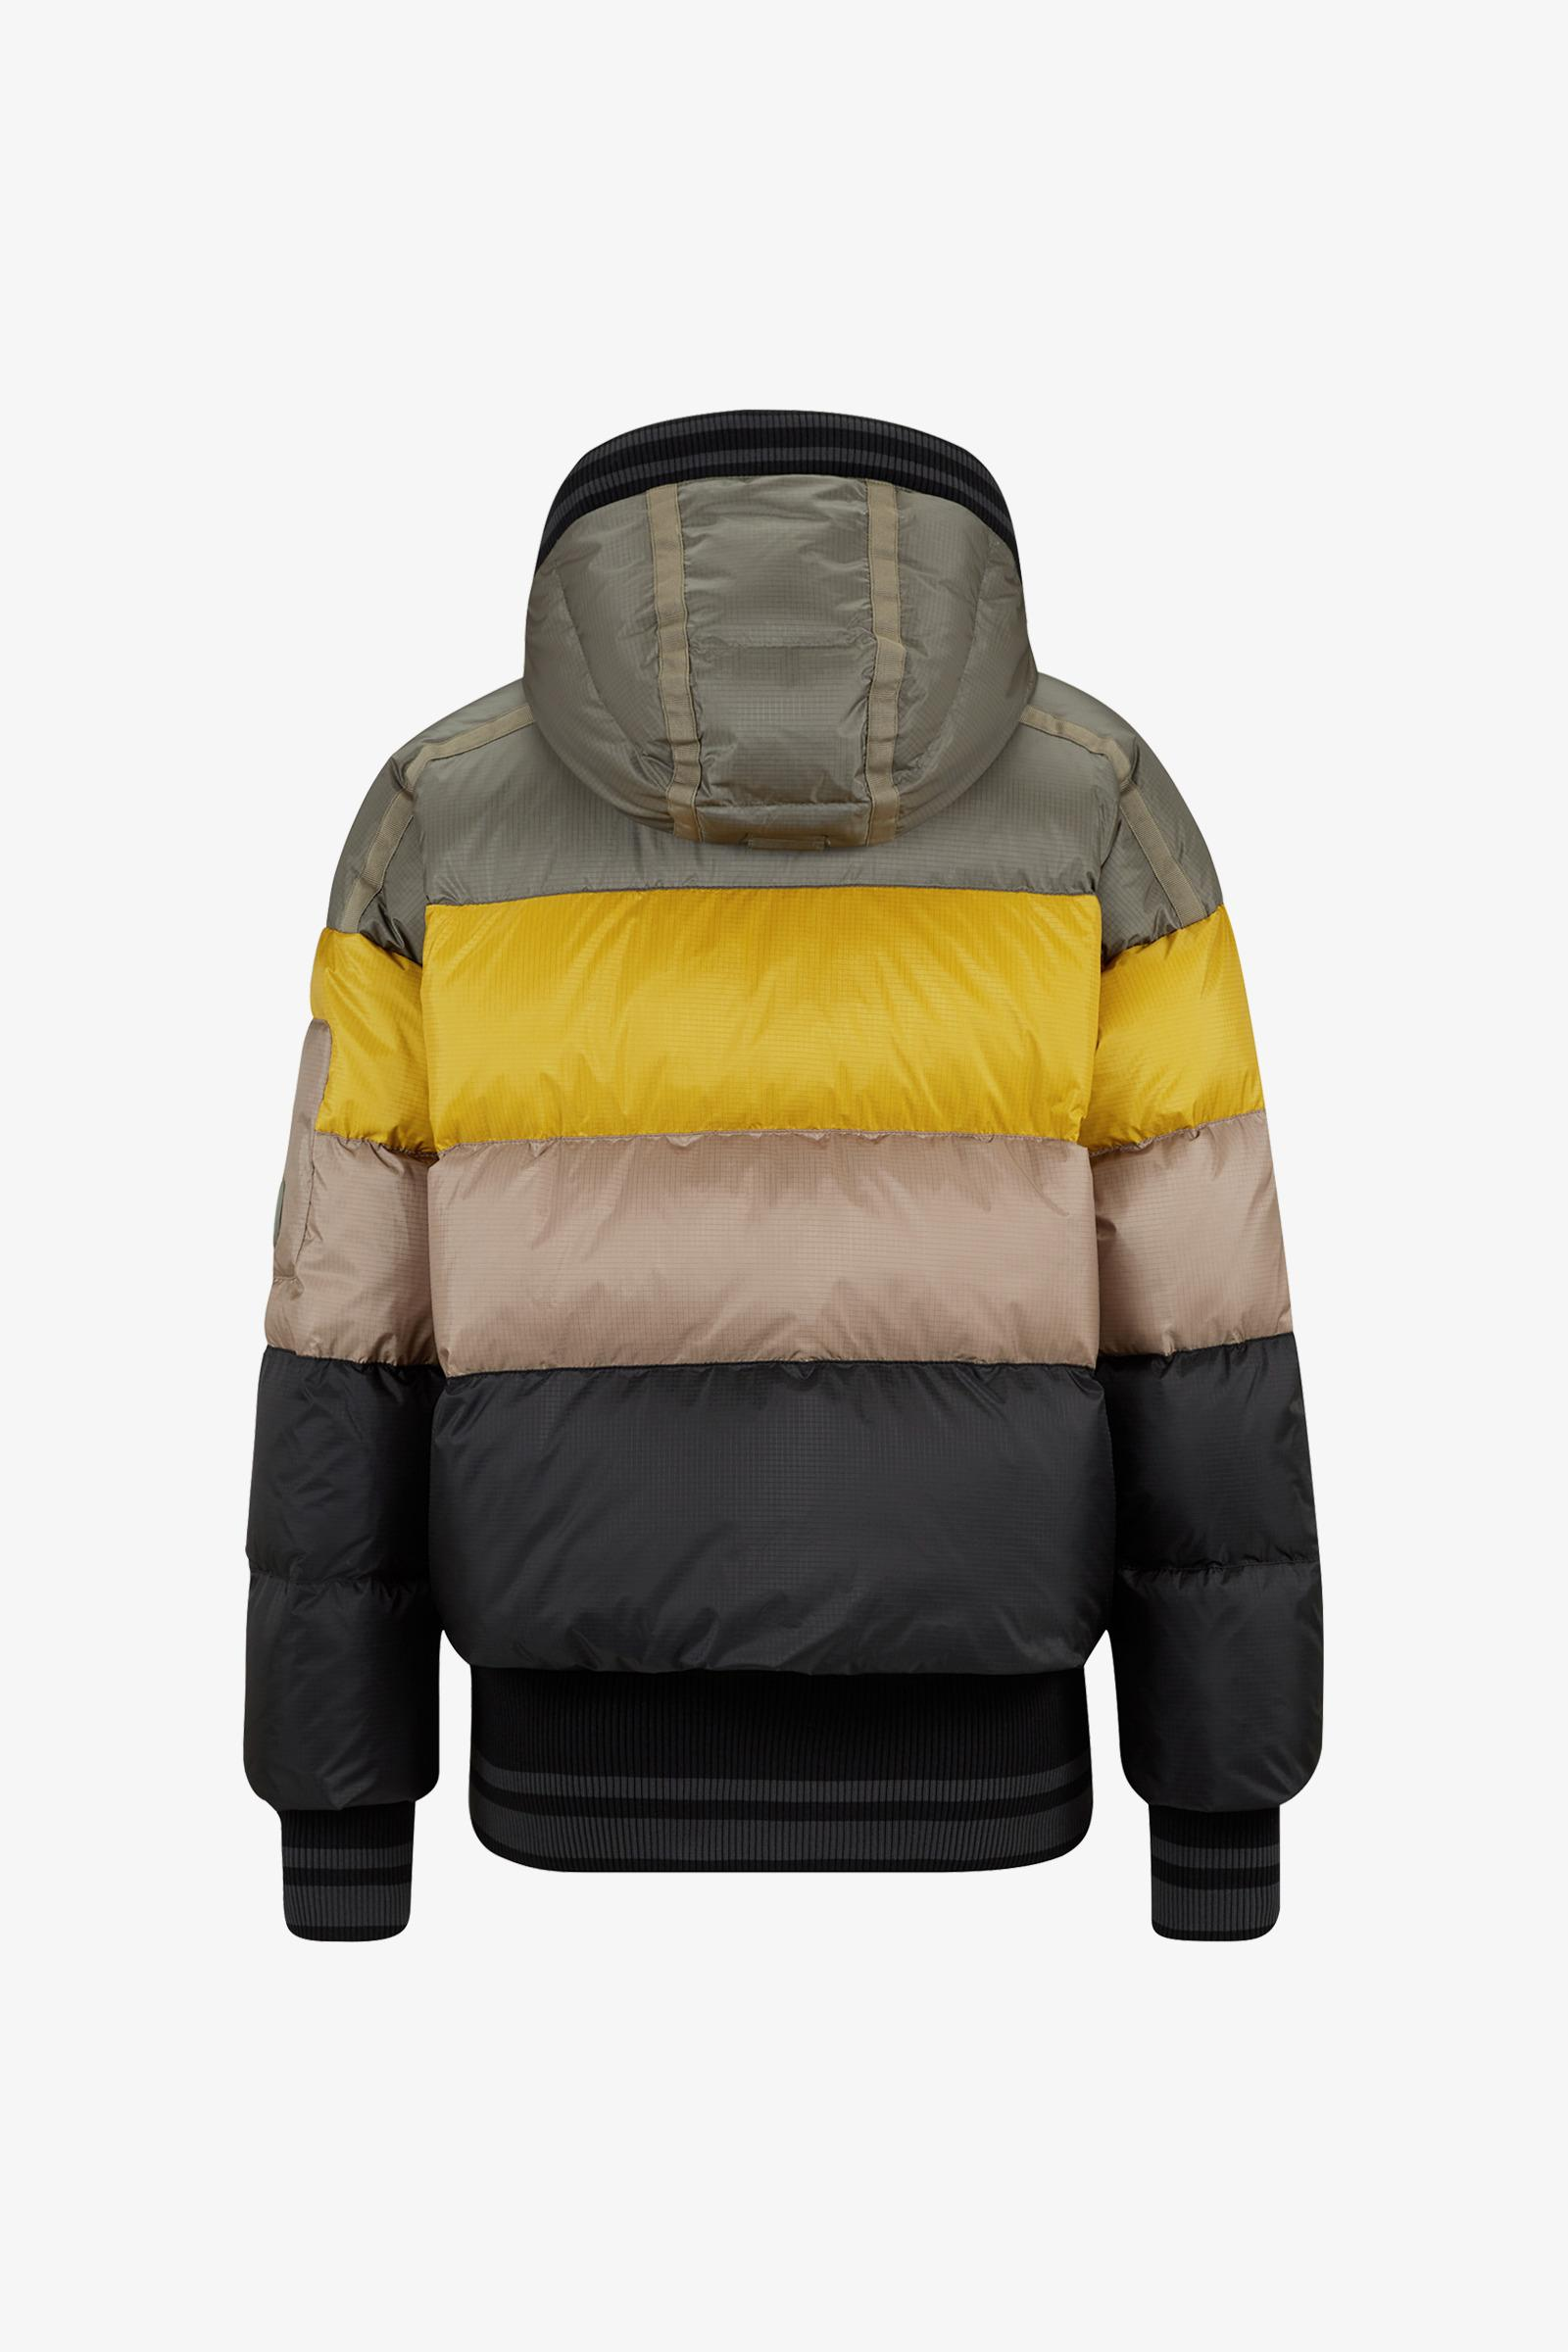 beliebte Marke populäres Design Top-Mode Velia Down Ski Jacket In Khaki/orange